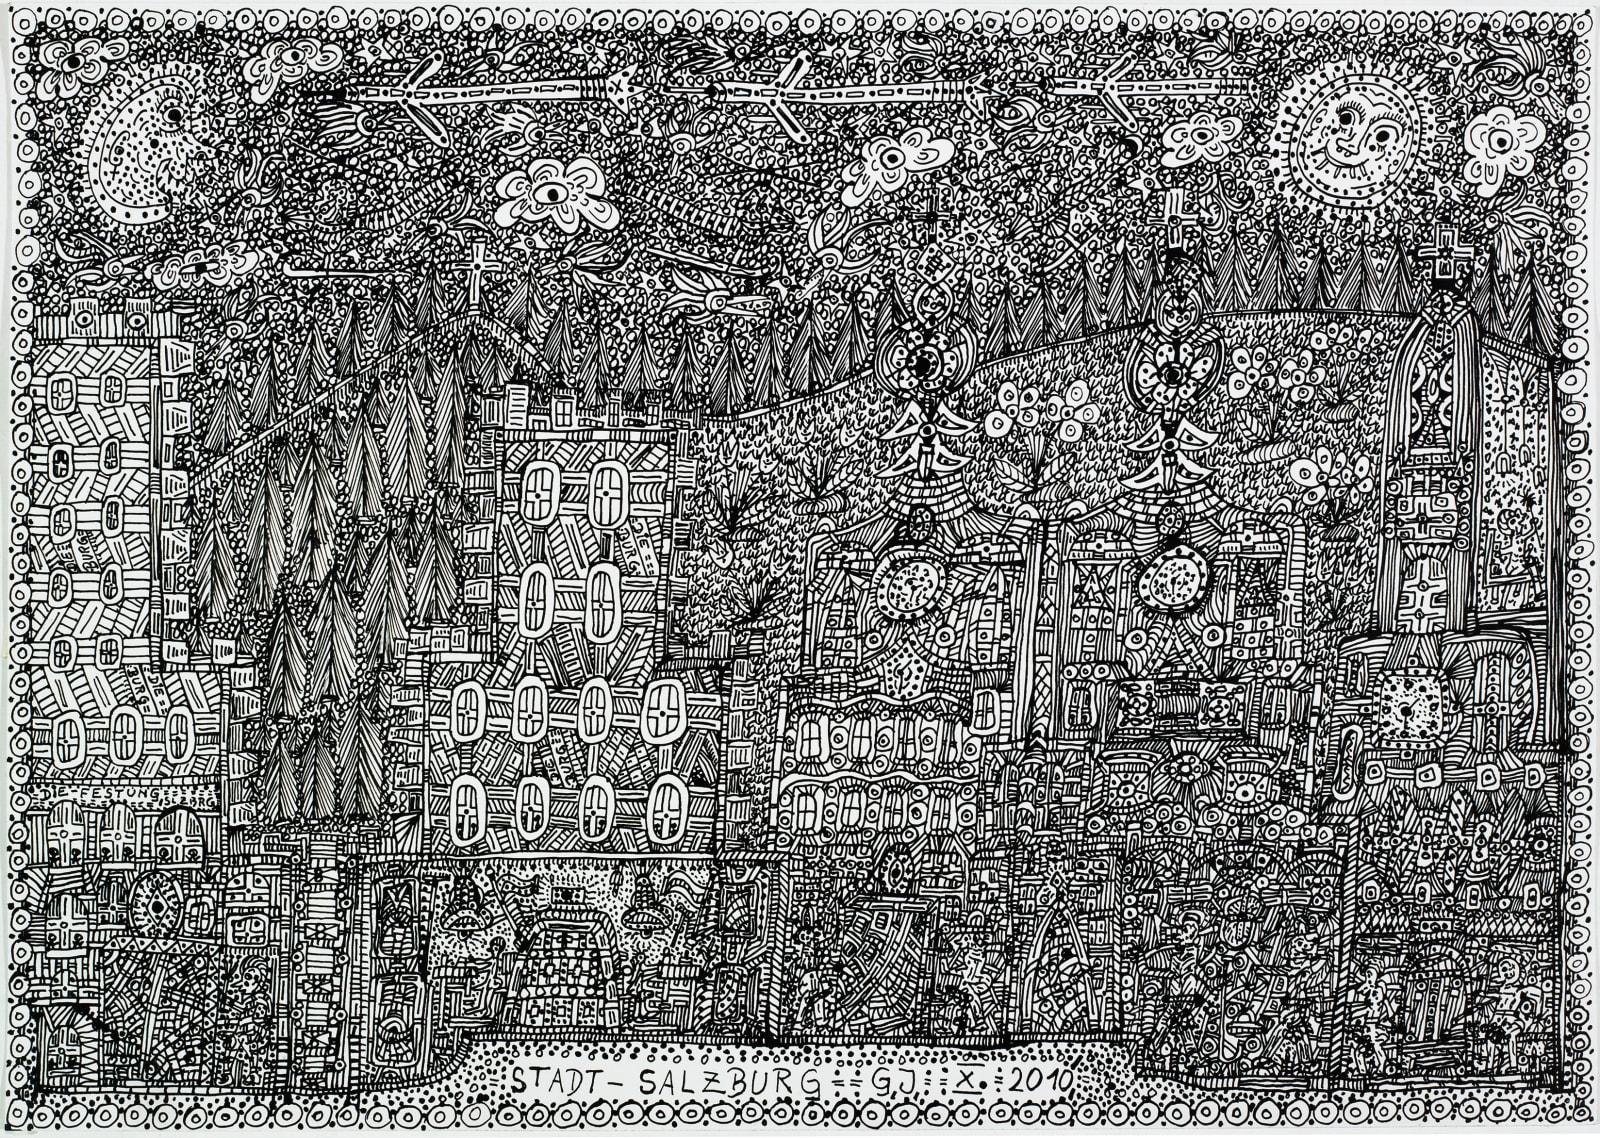 City-Salzburg, 2011 India ink on paper 11 3/4 x 16 1/2 in. (29.7 x 41.8 cm.) (JGG 14) $8,500